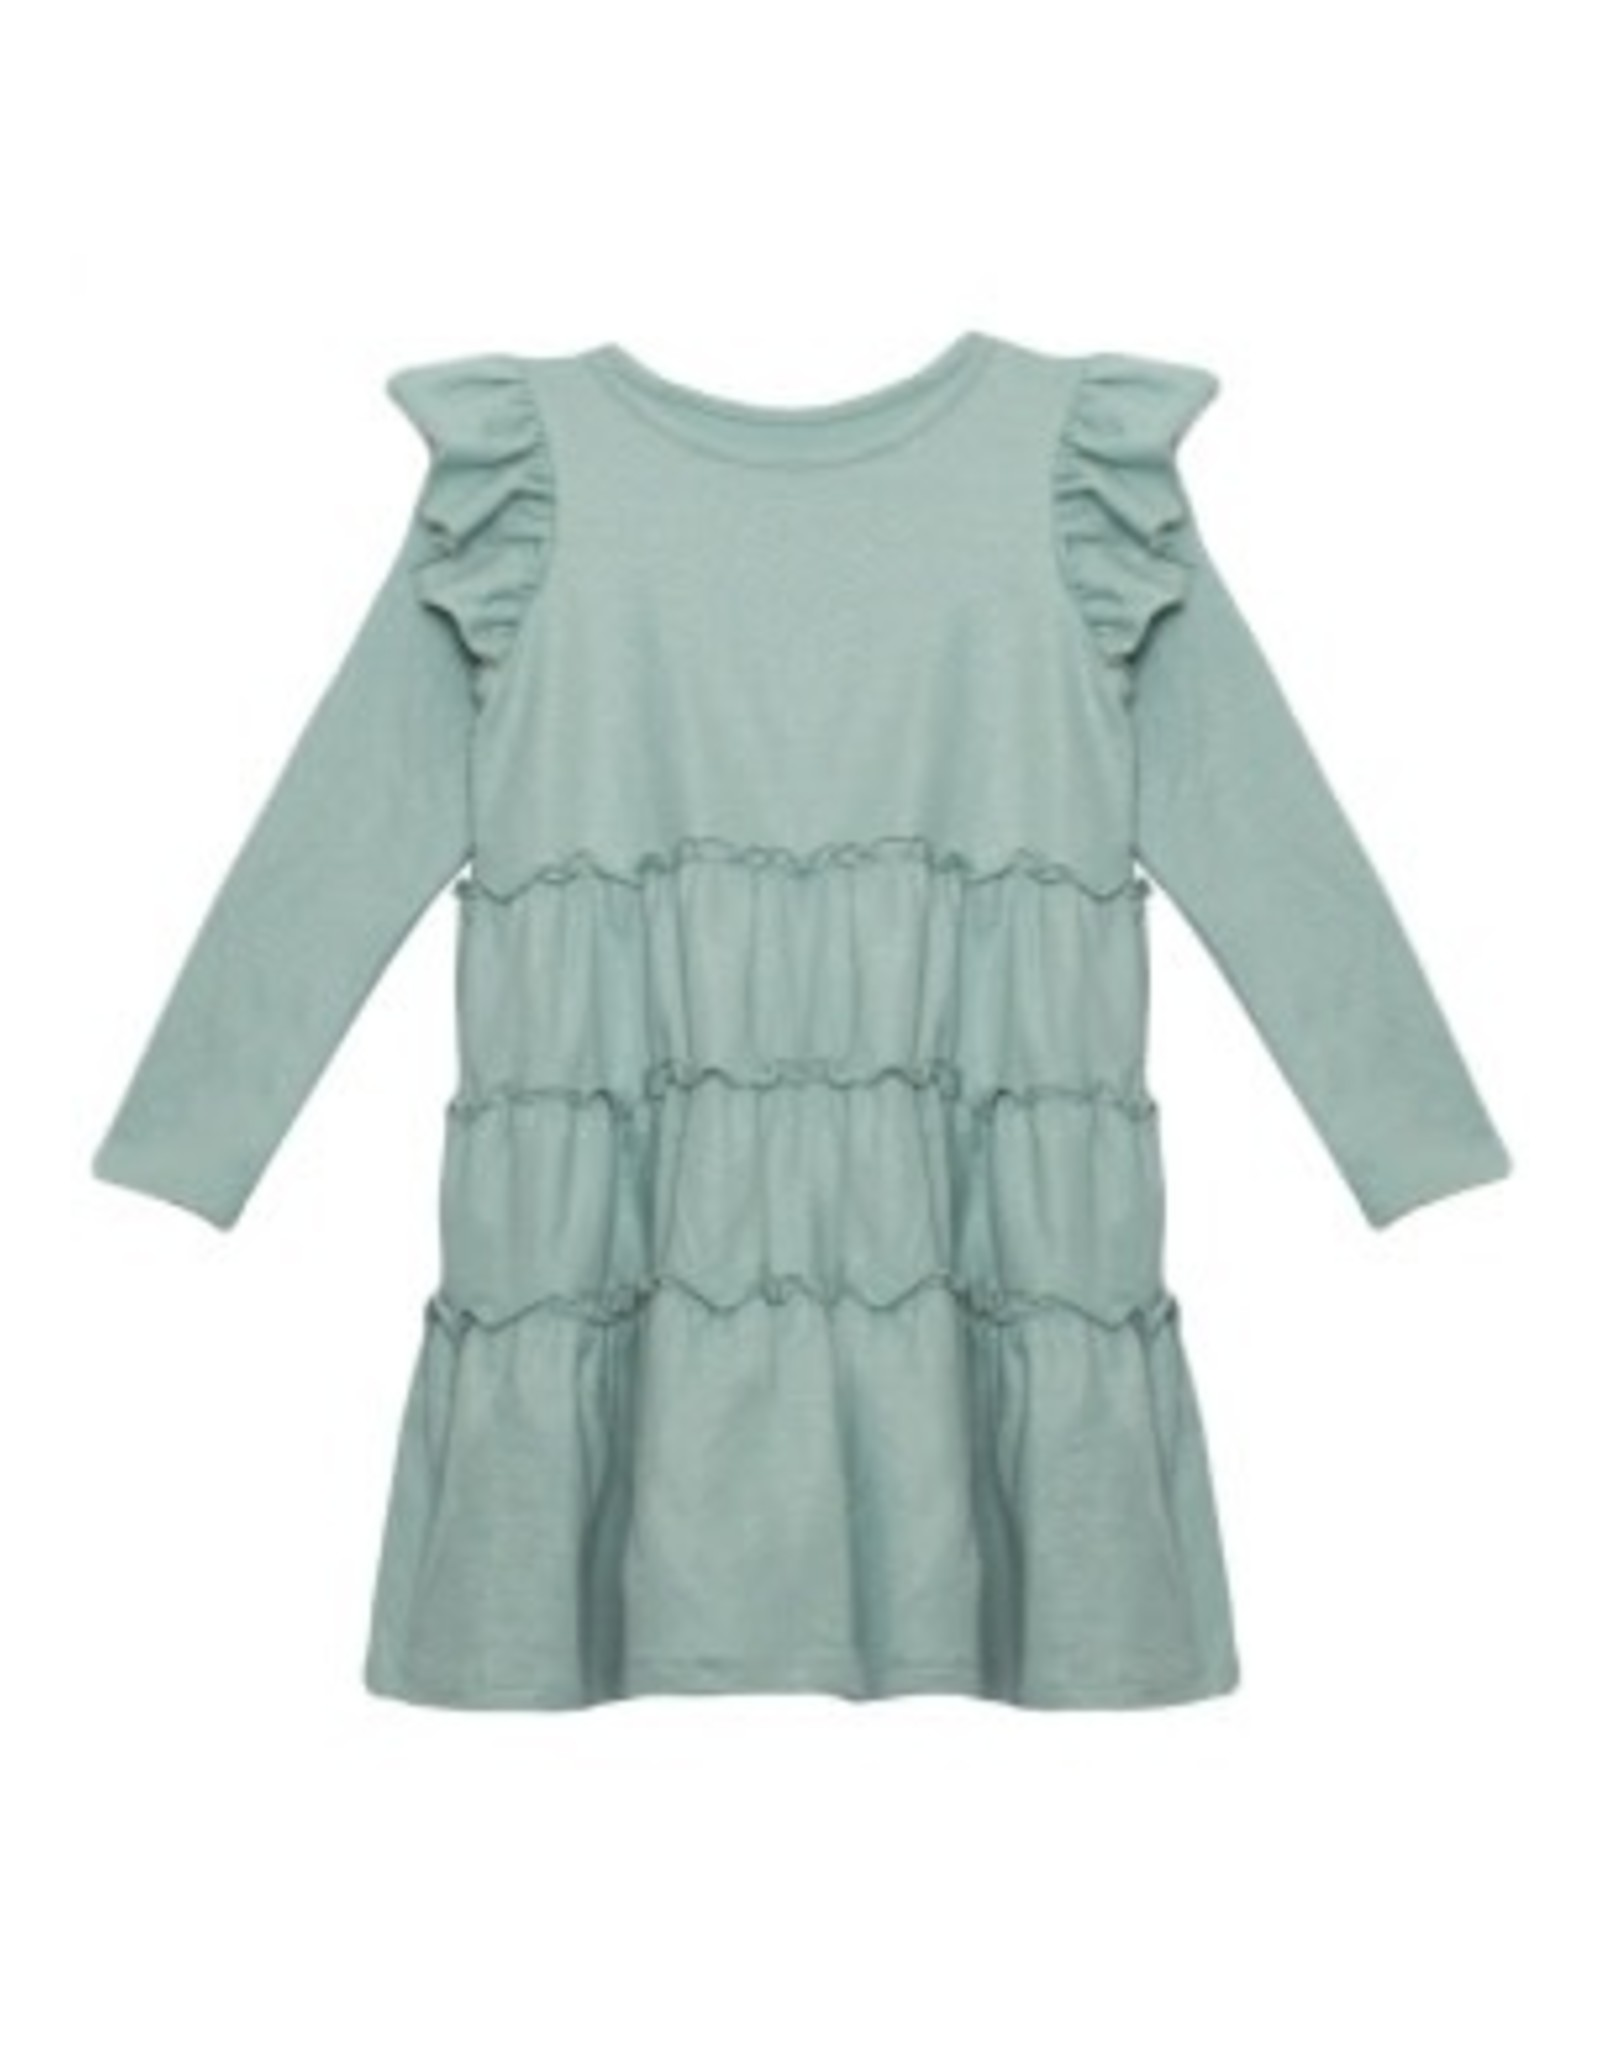 Mabel & Honey Mabel & Honey- LS Sparkling Turquoise Knit Dress